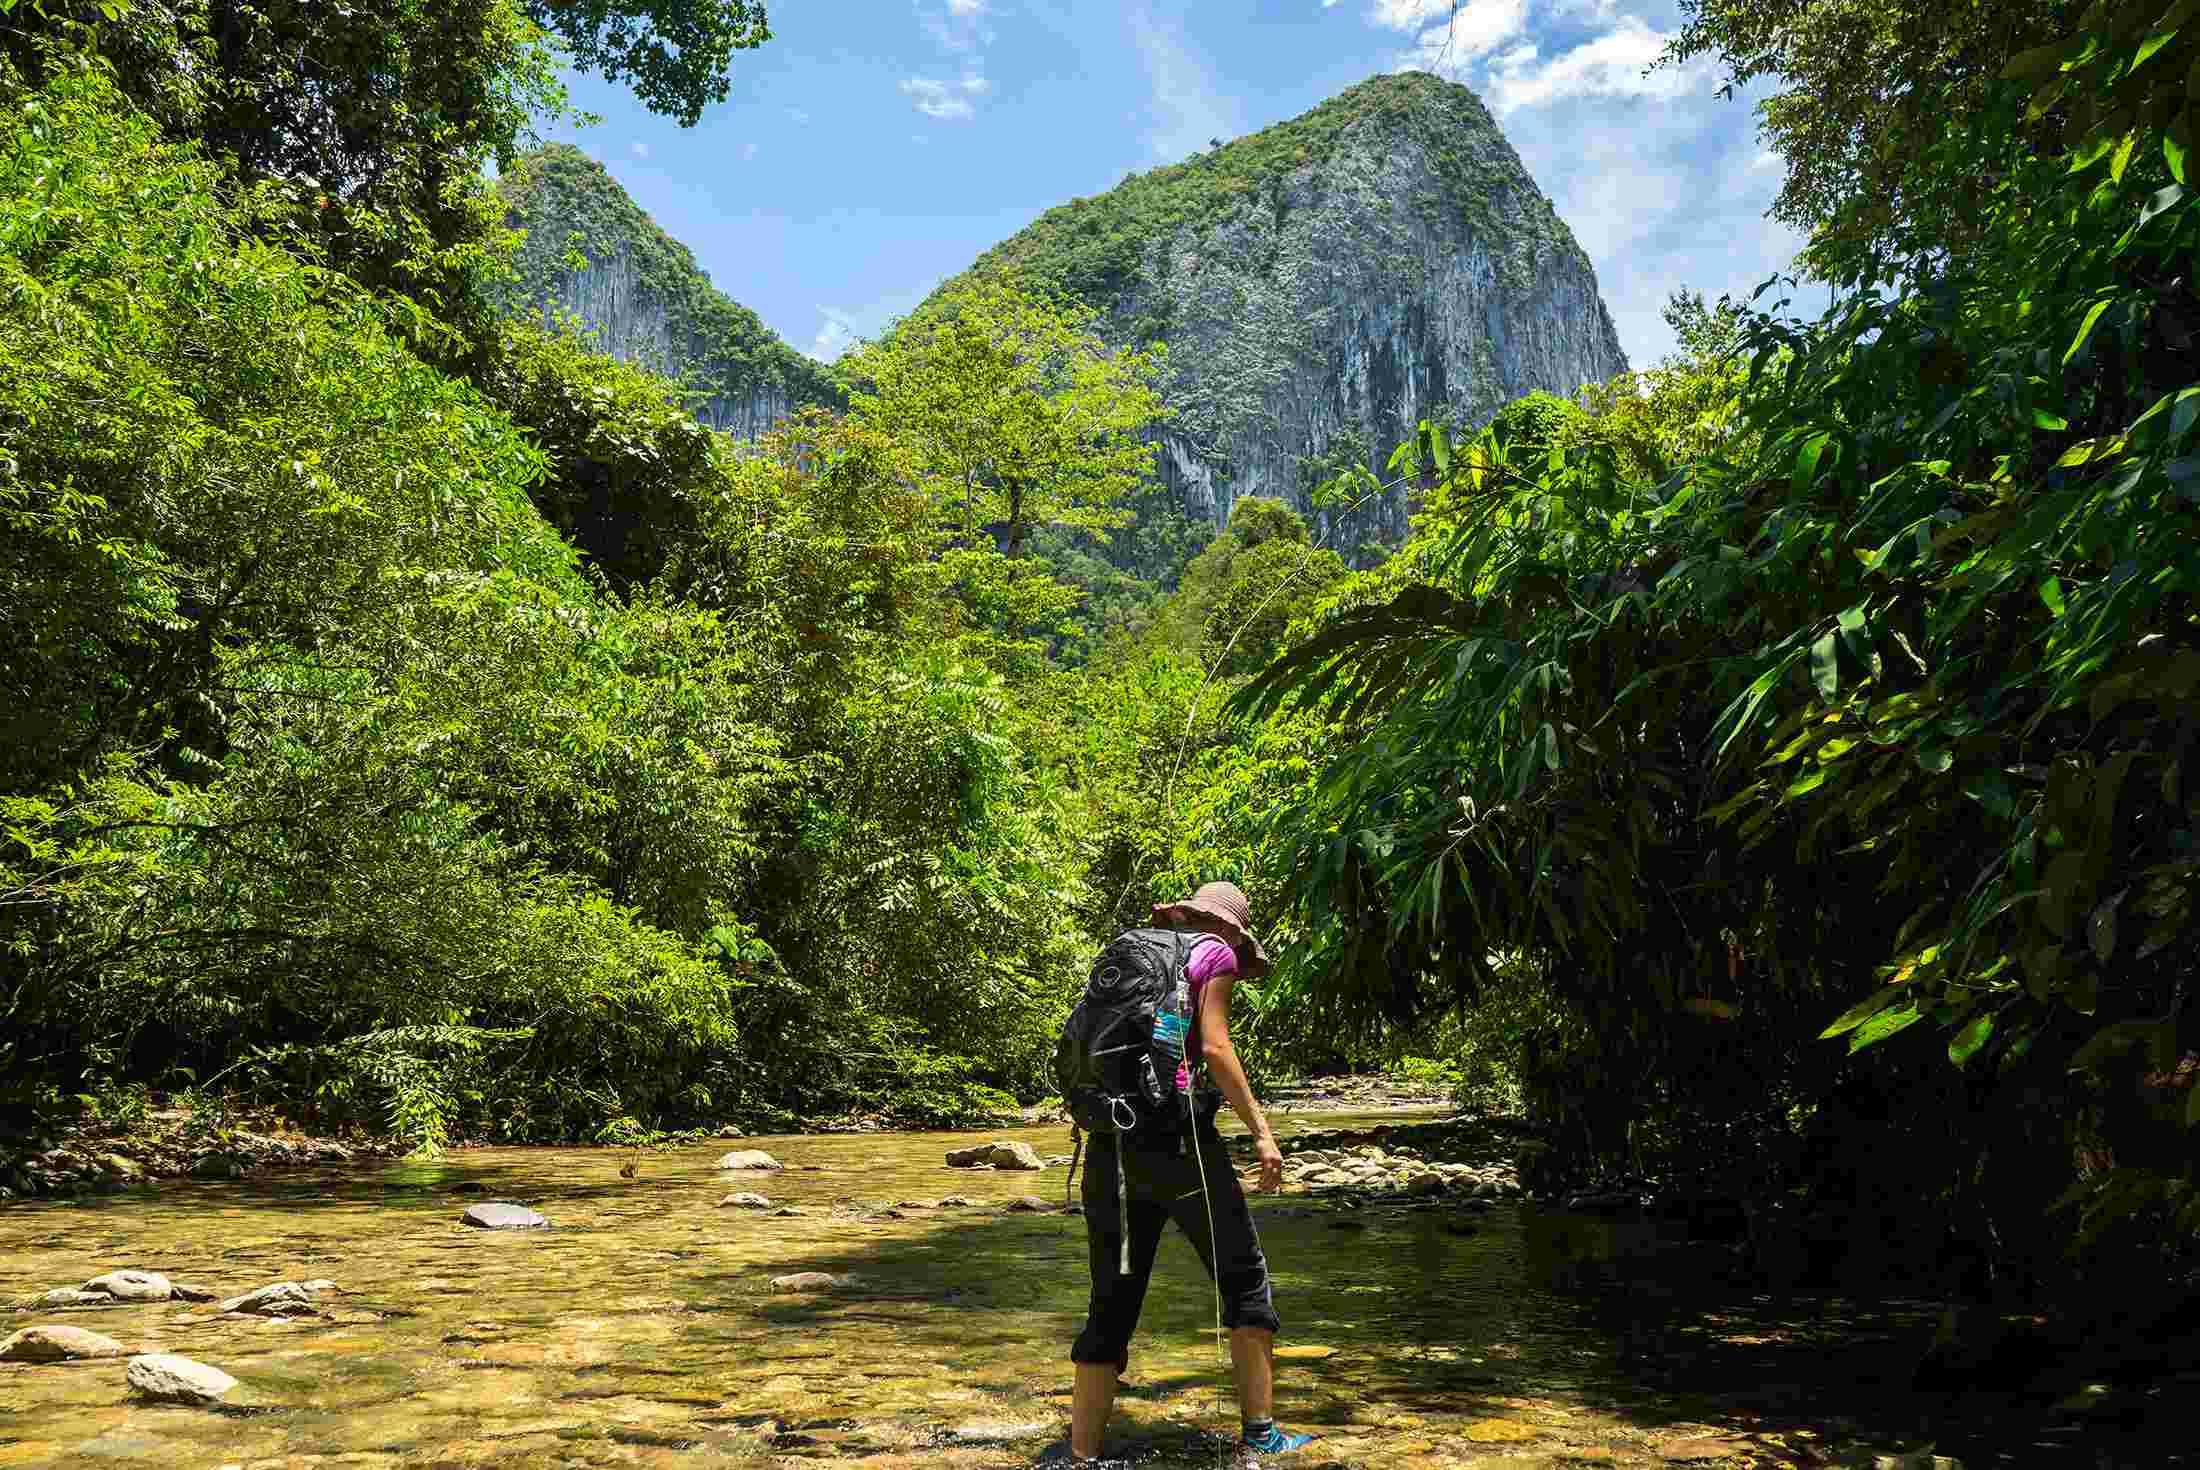 Sarawak Rainforest World Music Festival | Intrepid Travel